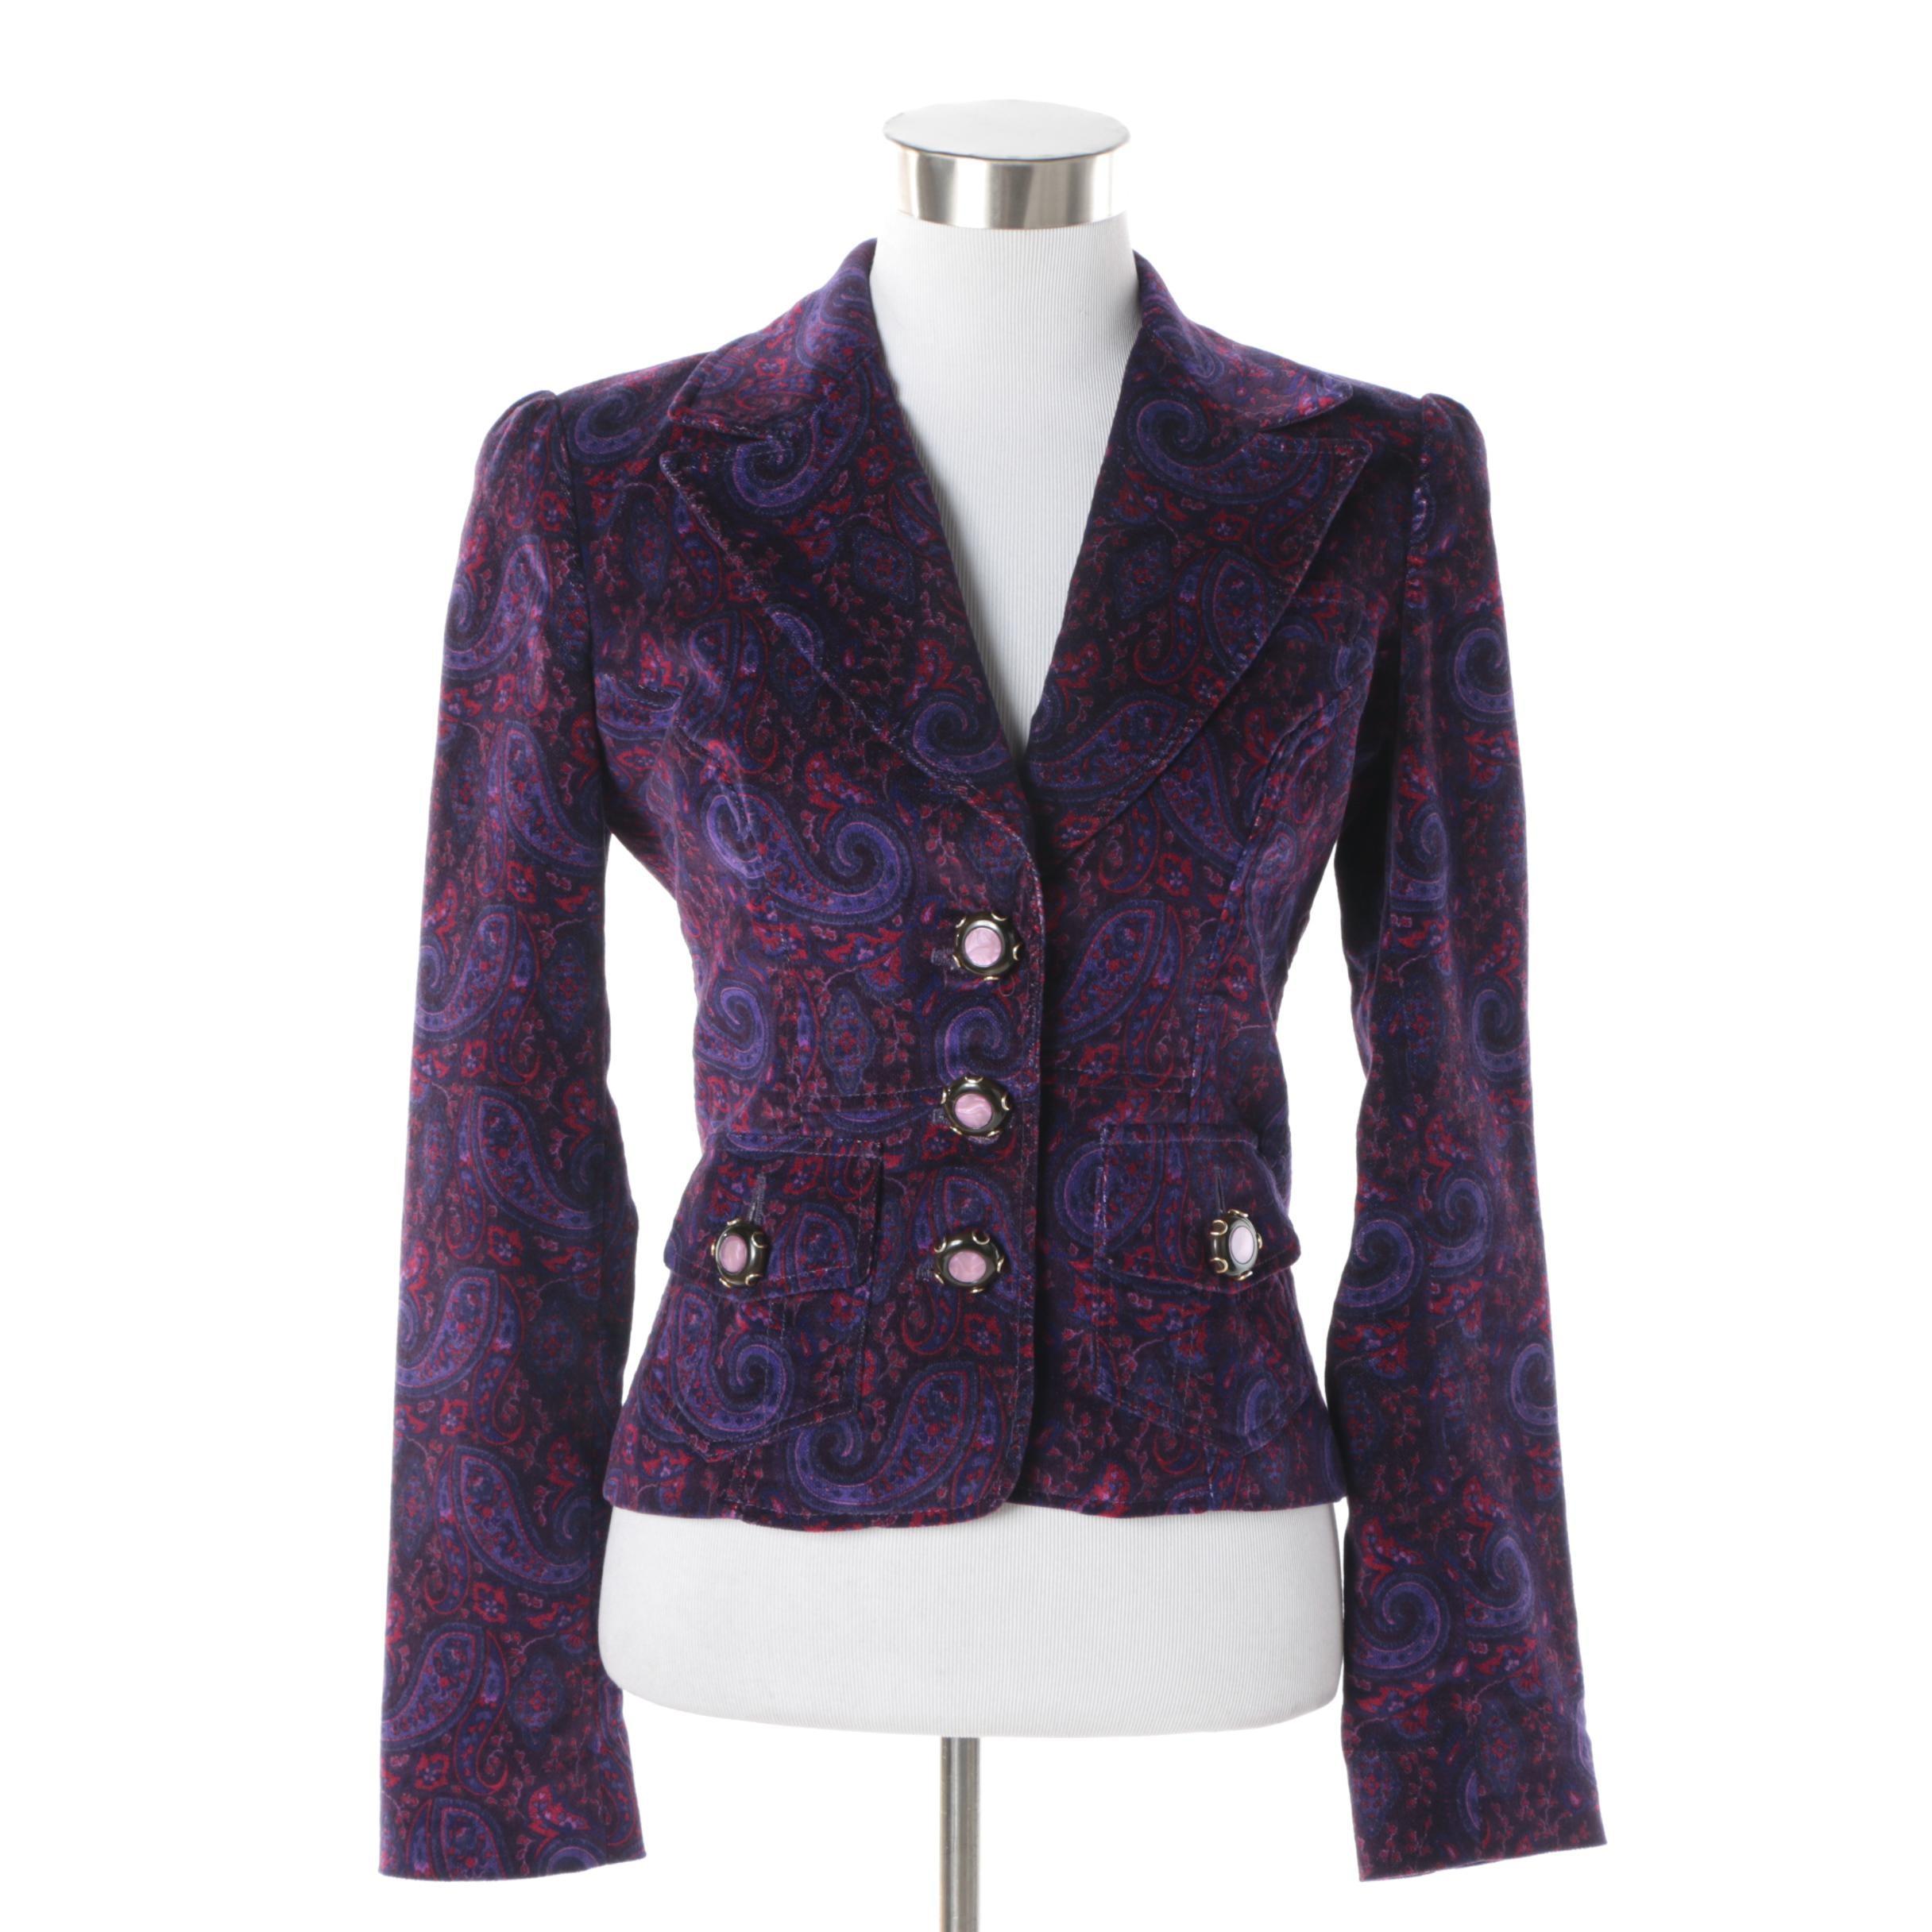 Women's Dolce & Gabbana Purple Paisley Velvet Jacket